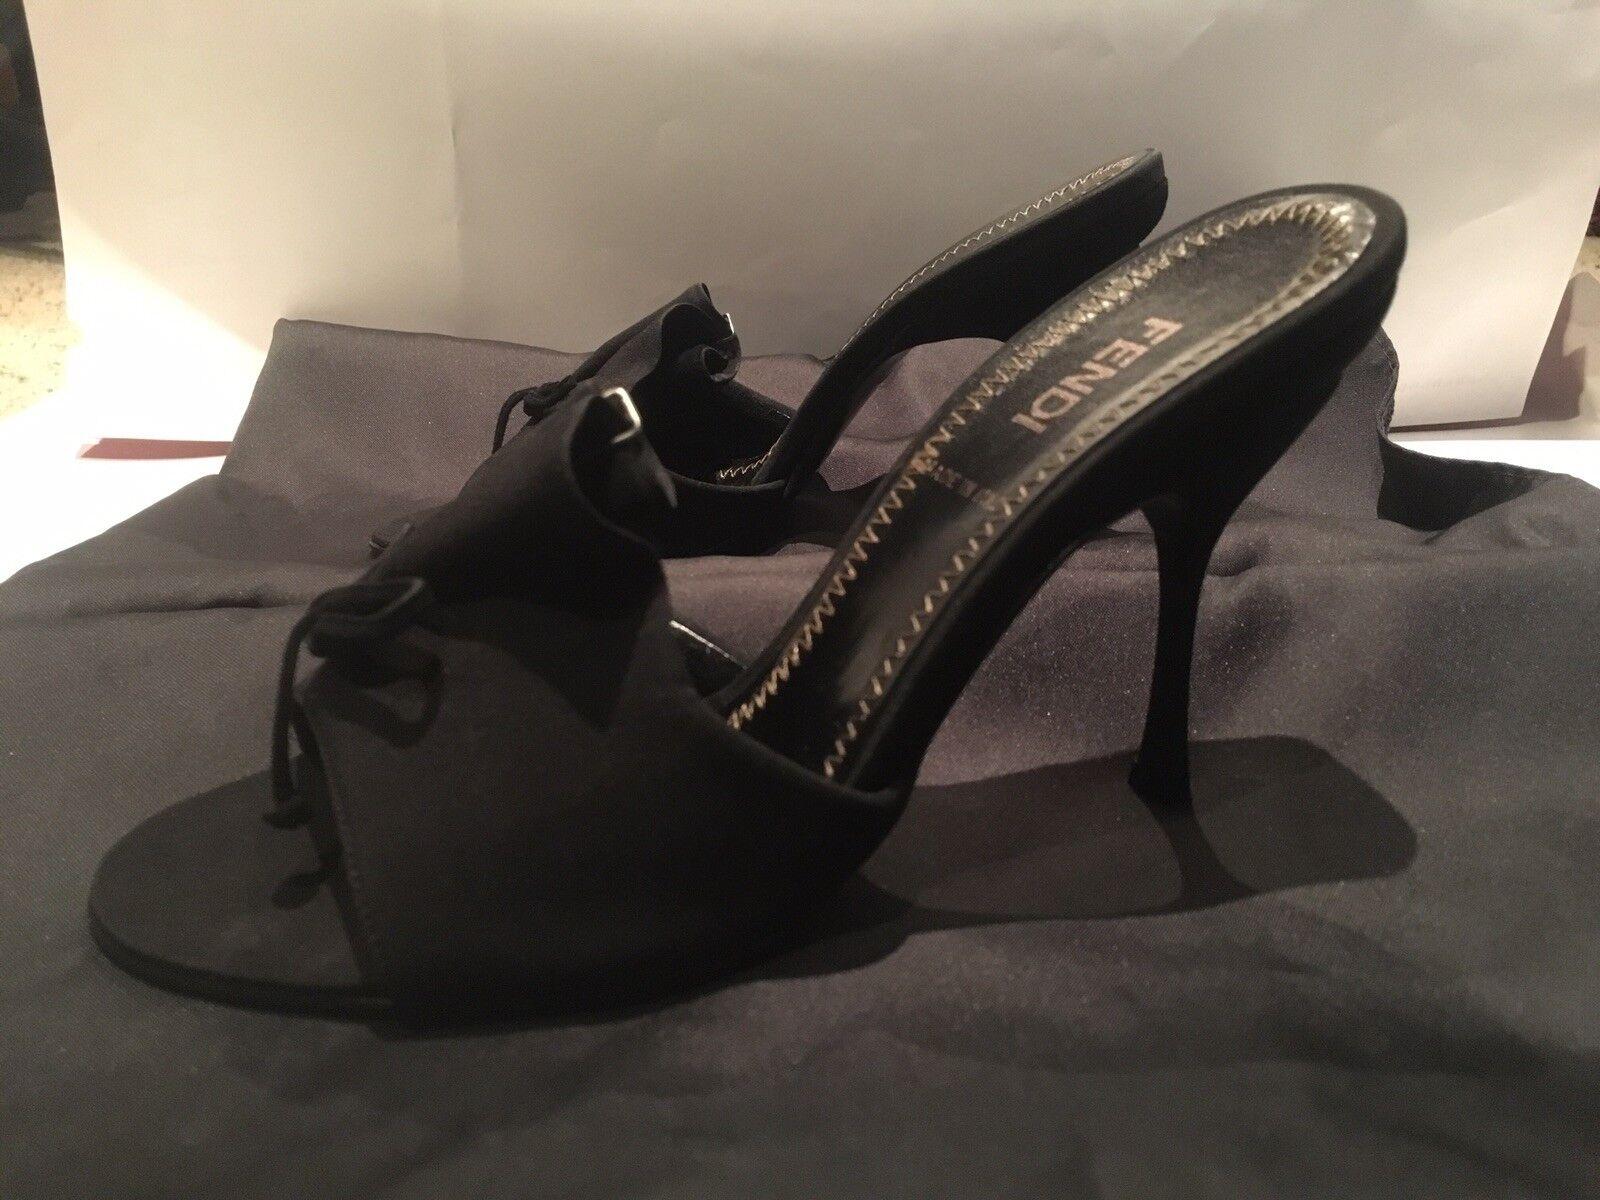 Fendi Women's High Heel shoes. Size 36. Brand New.